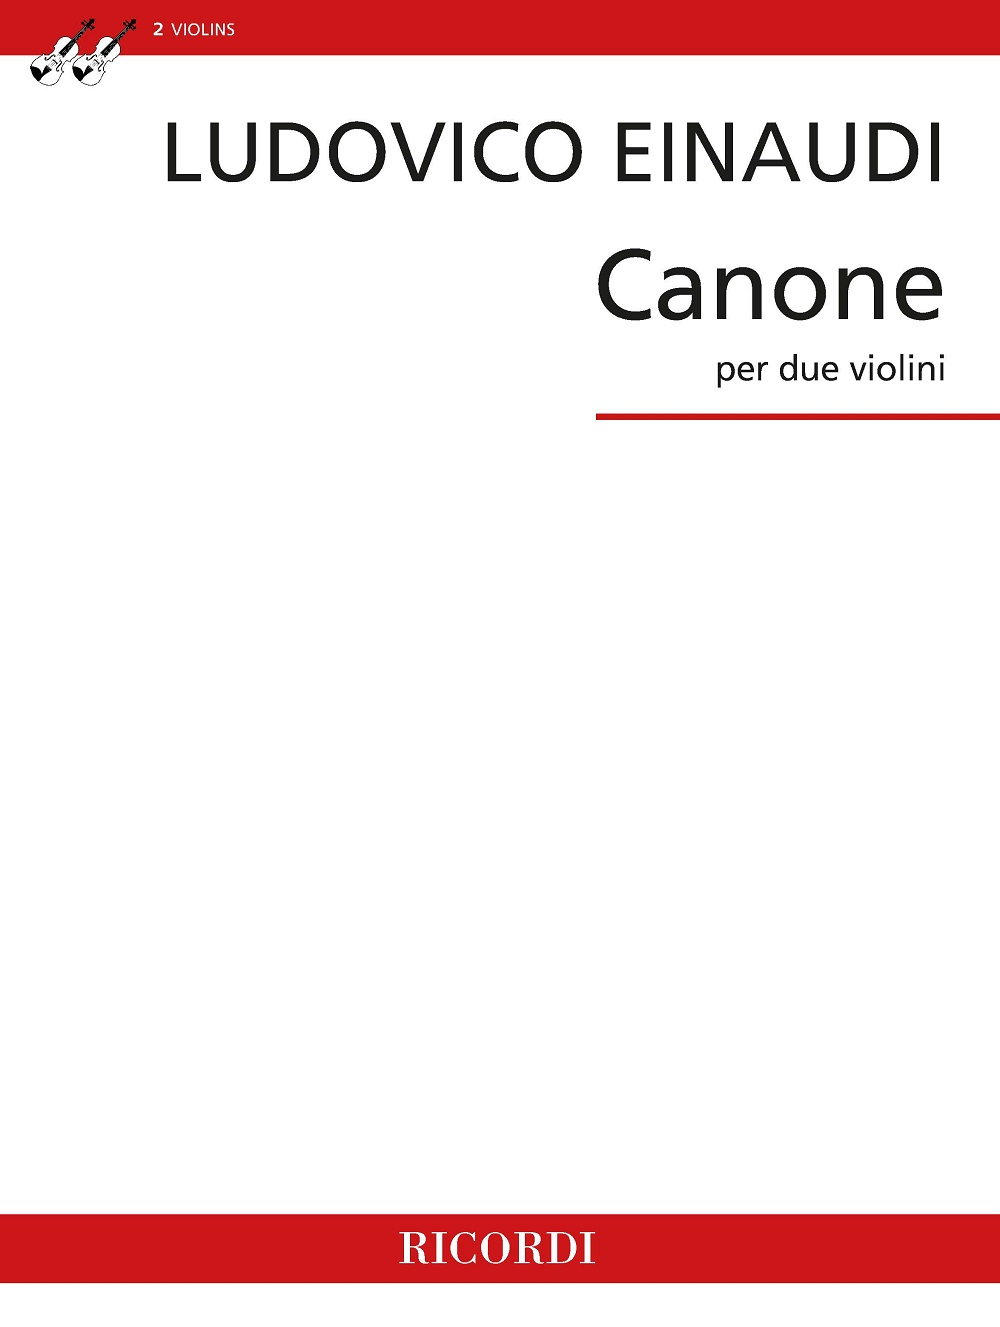 Ludovico Einaudi: Canone per due violini: Violin Duet: Instrumental Work